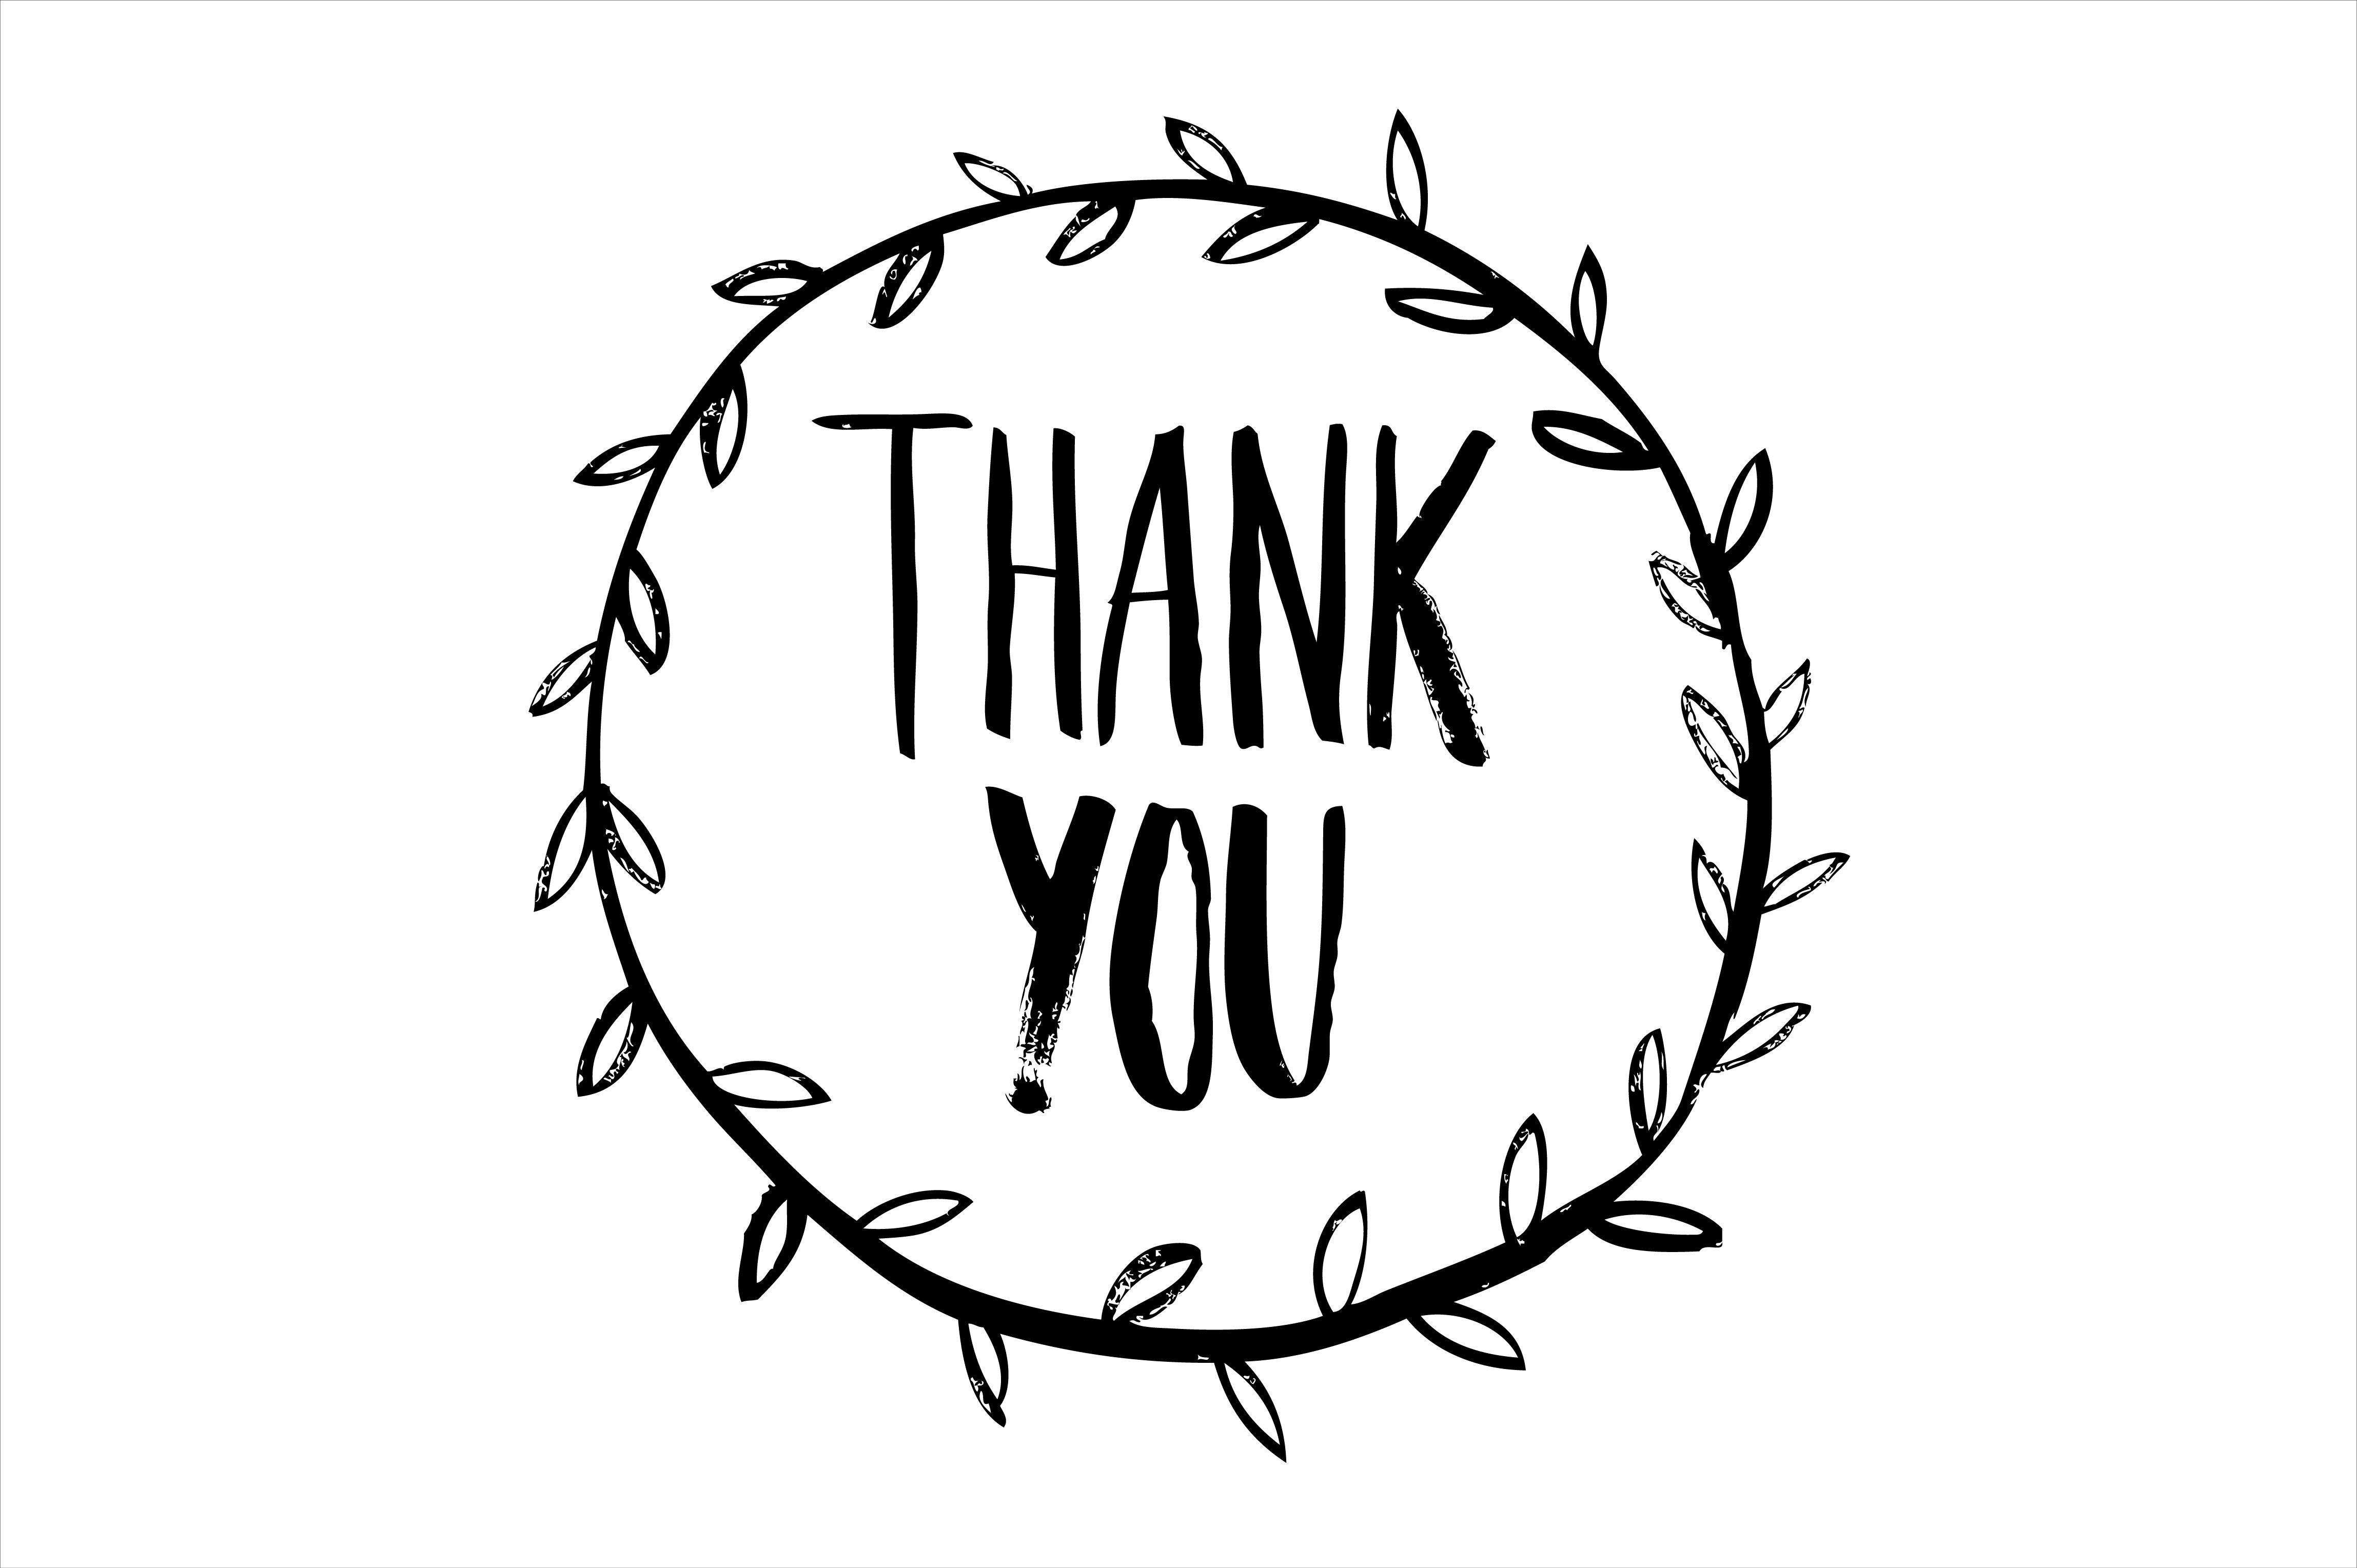 thank you calligraphy vector by lyeyee on Creative Market